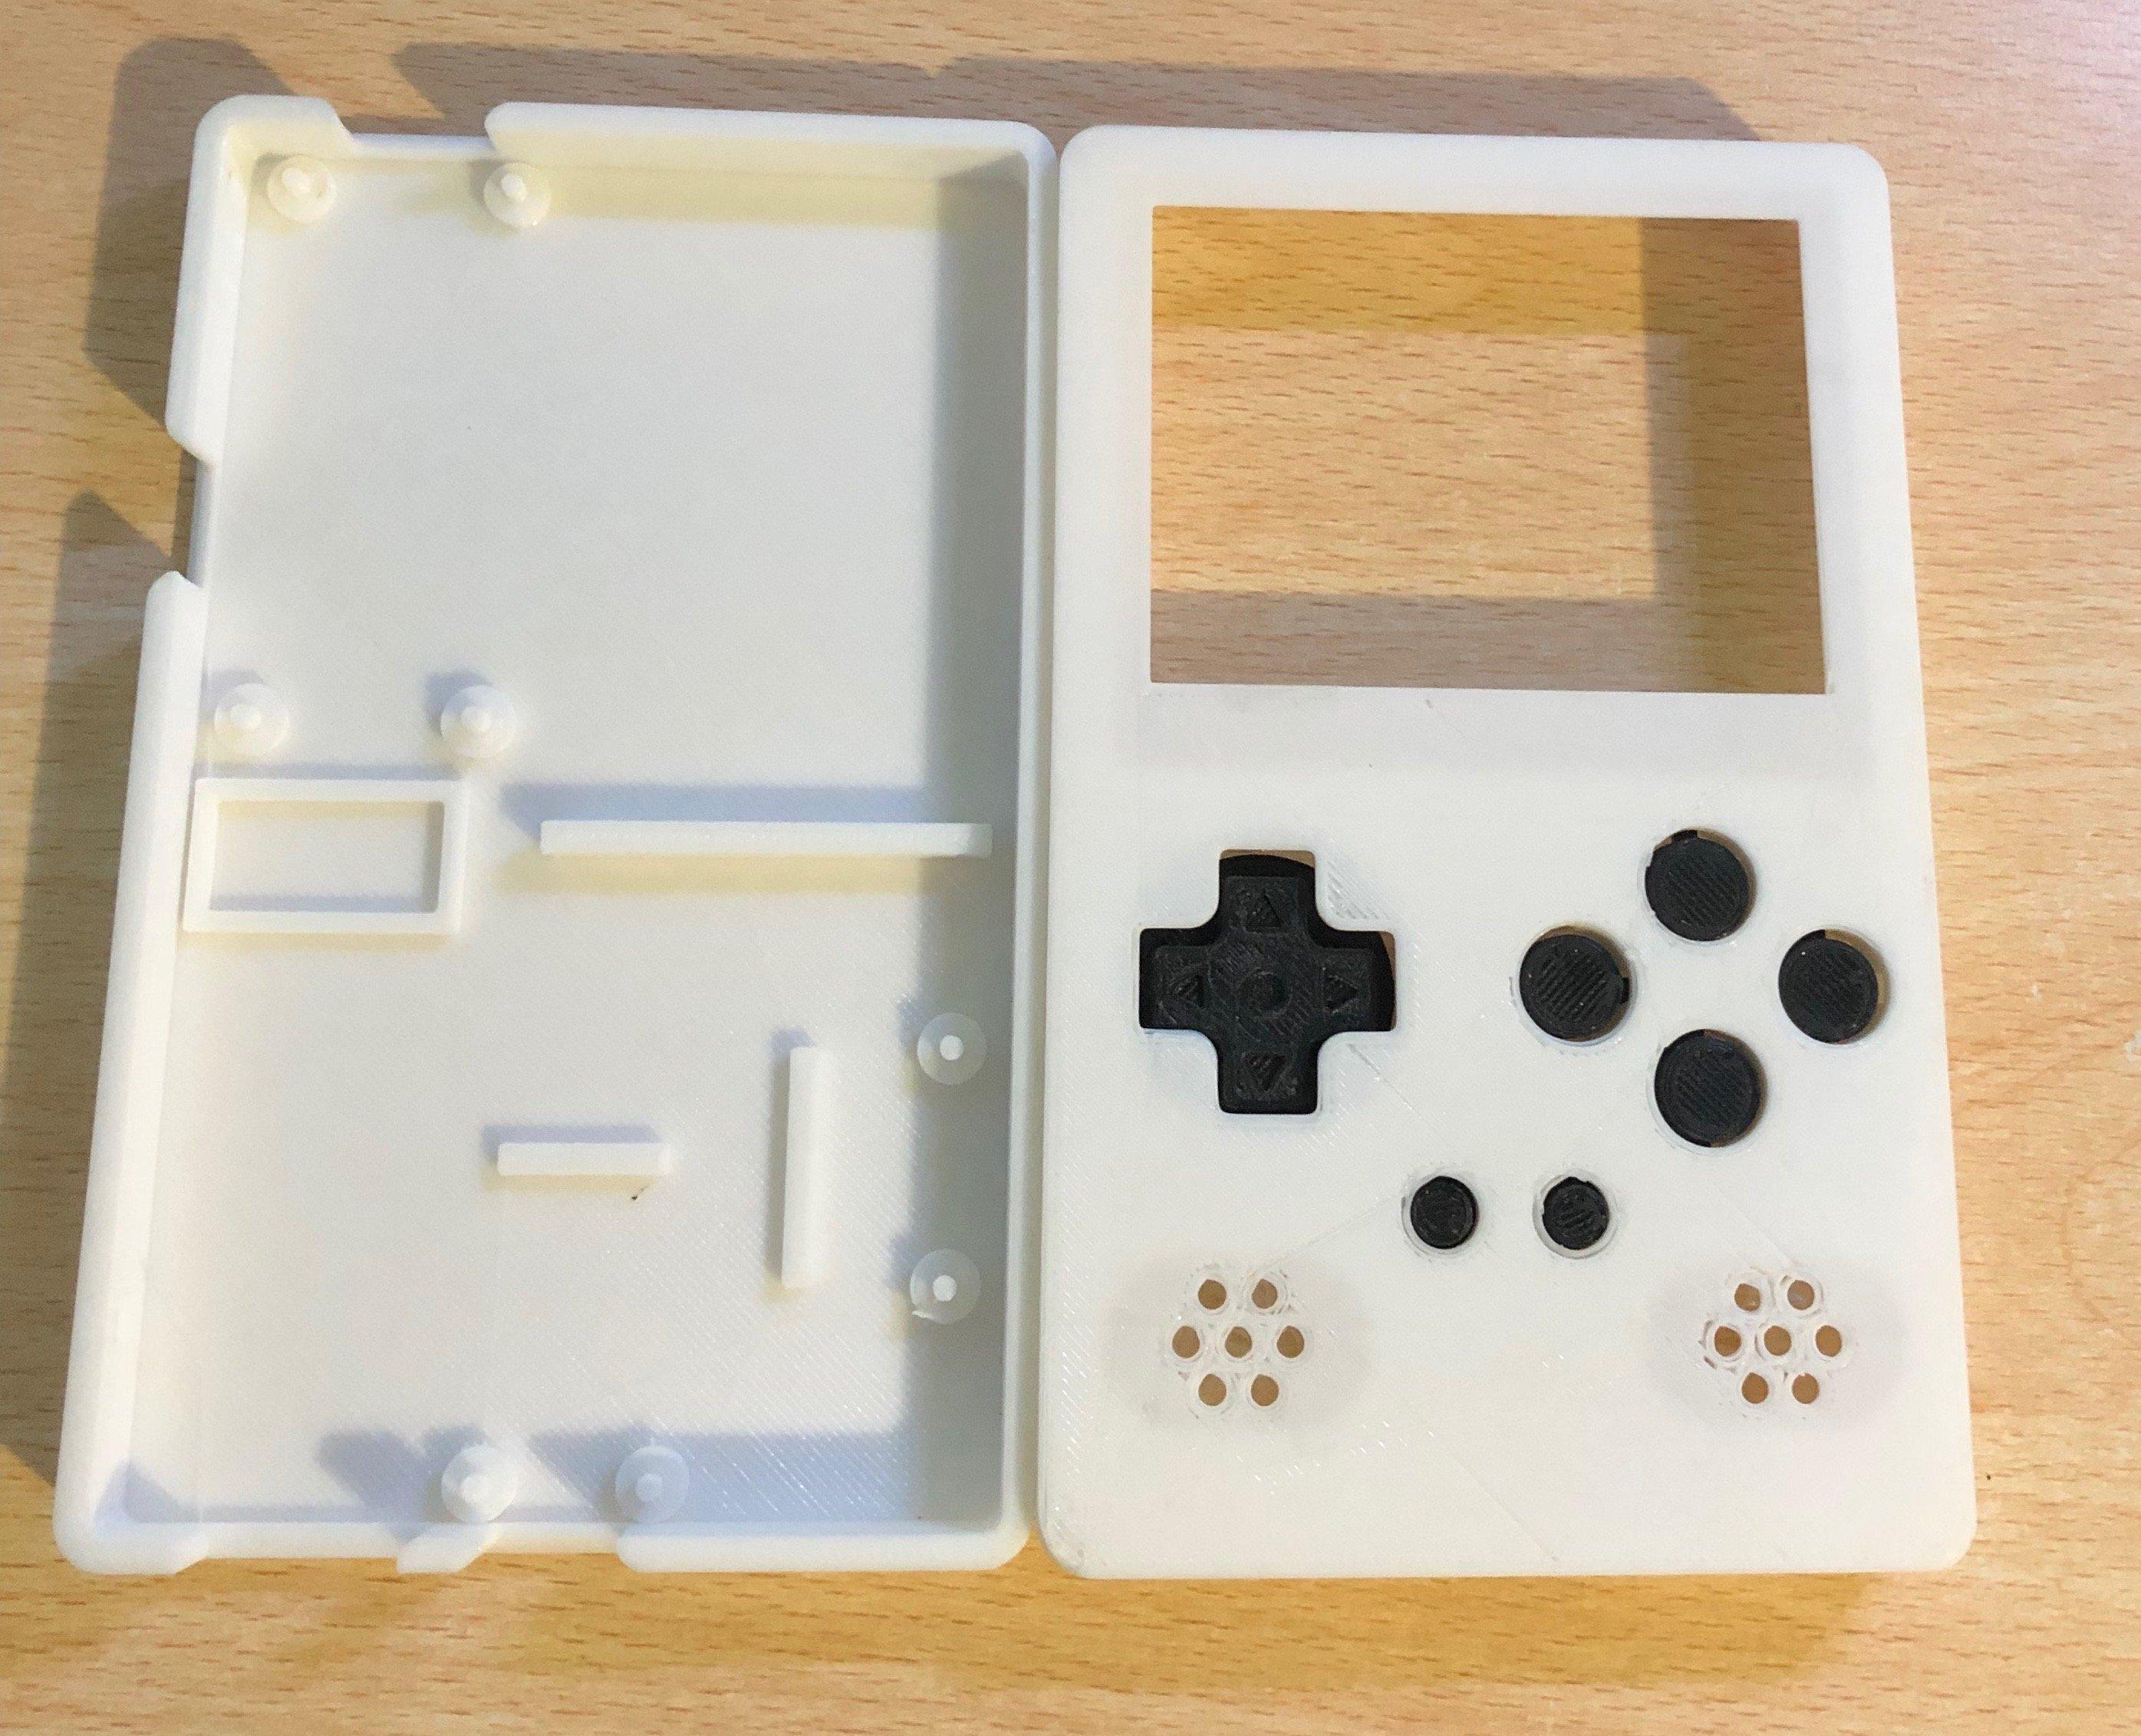 Portable RetroPie Emulator with Raspberry Pi Zero (Gameboy